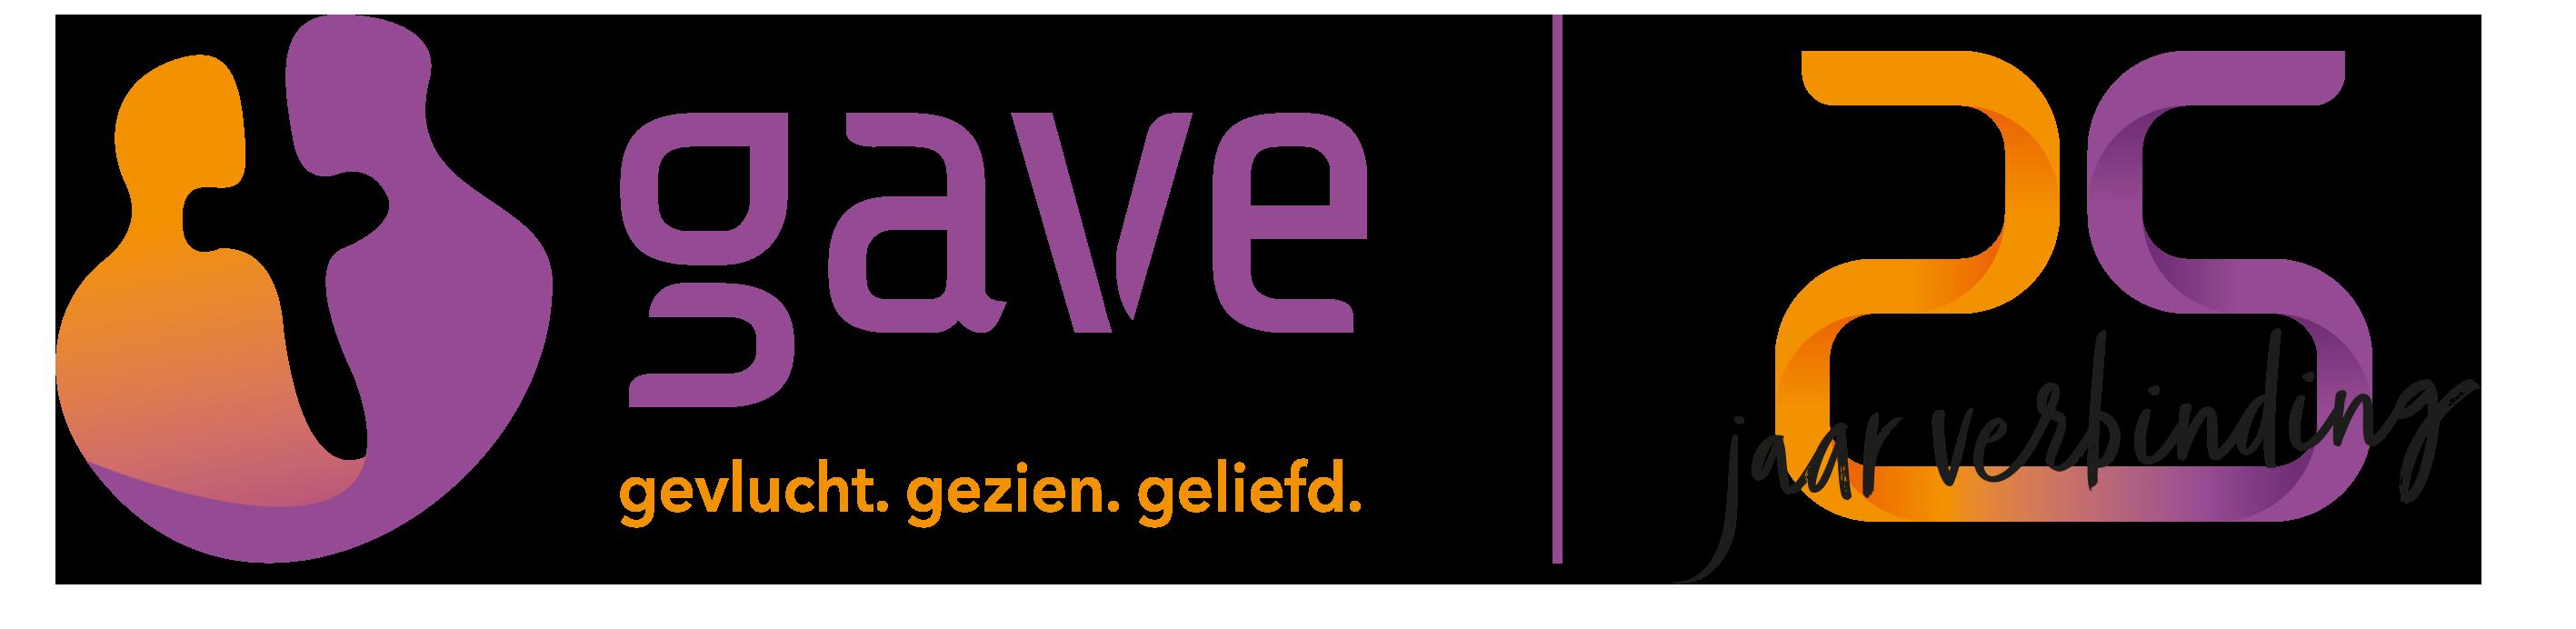 Gave Meldpunt Logo